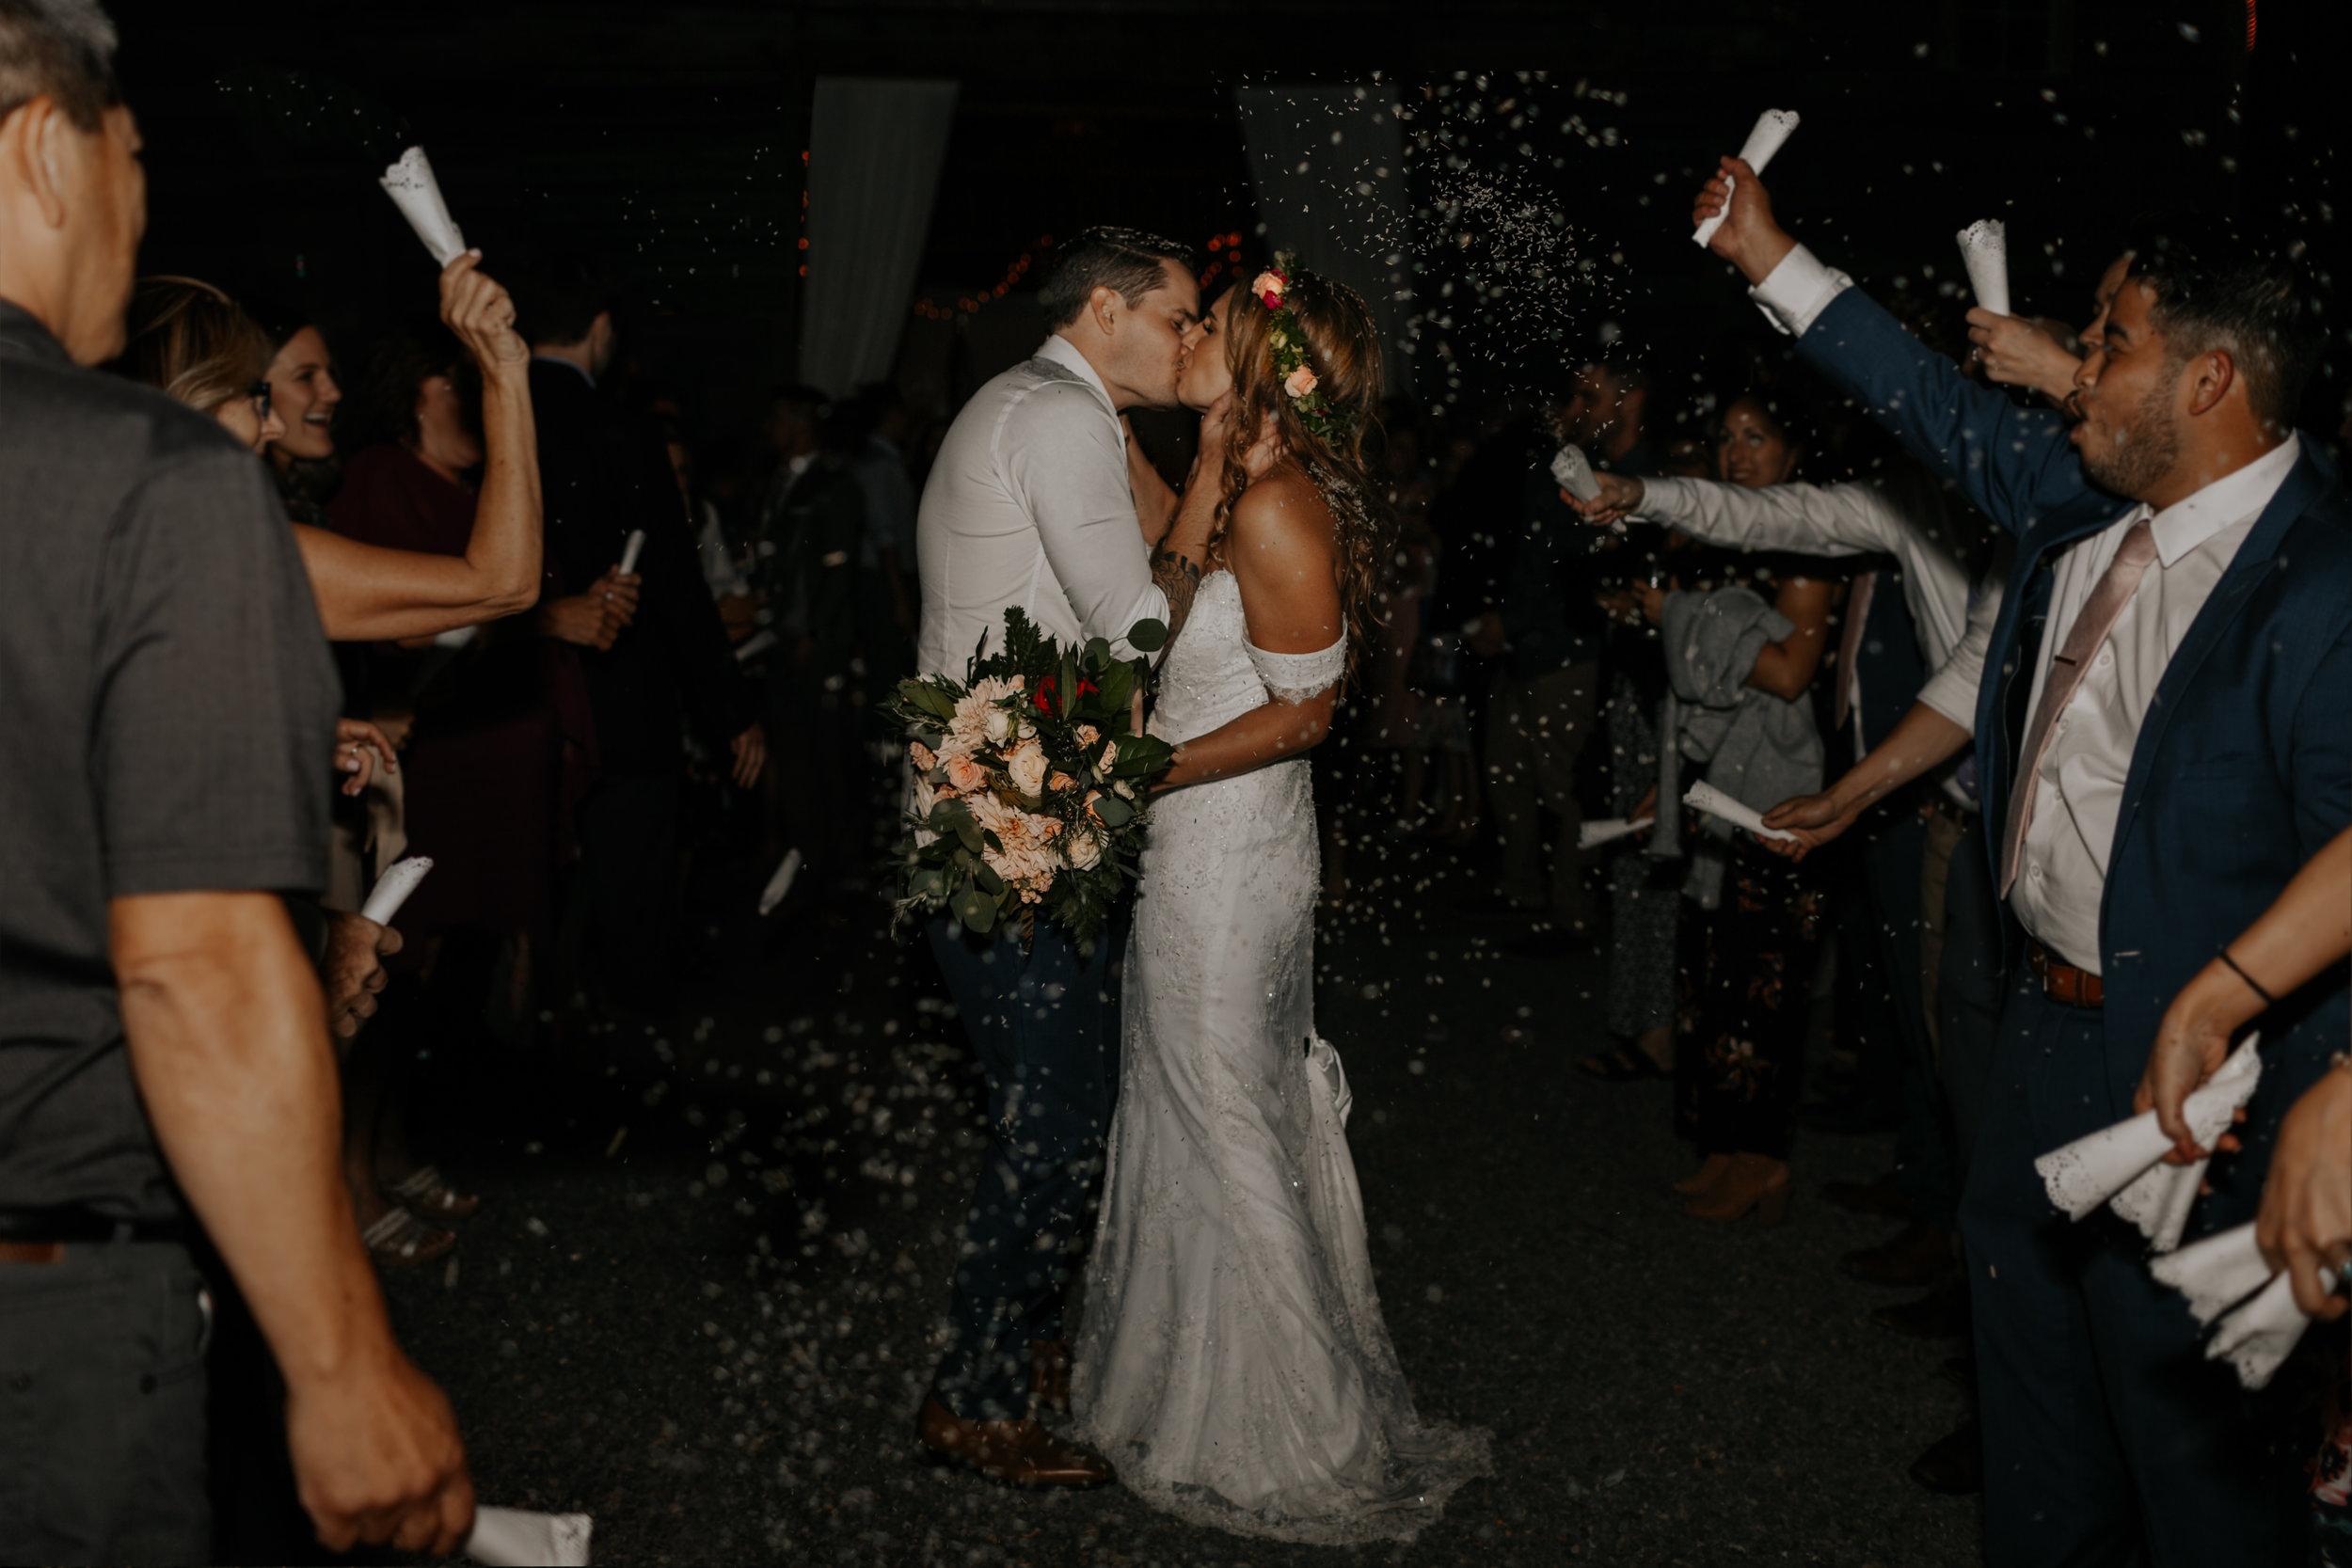 ginapaulson_jakitrevor_wedding-1195.jpg